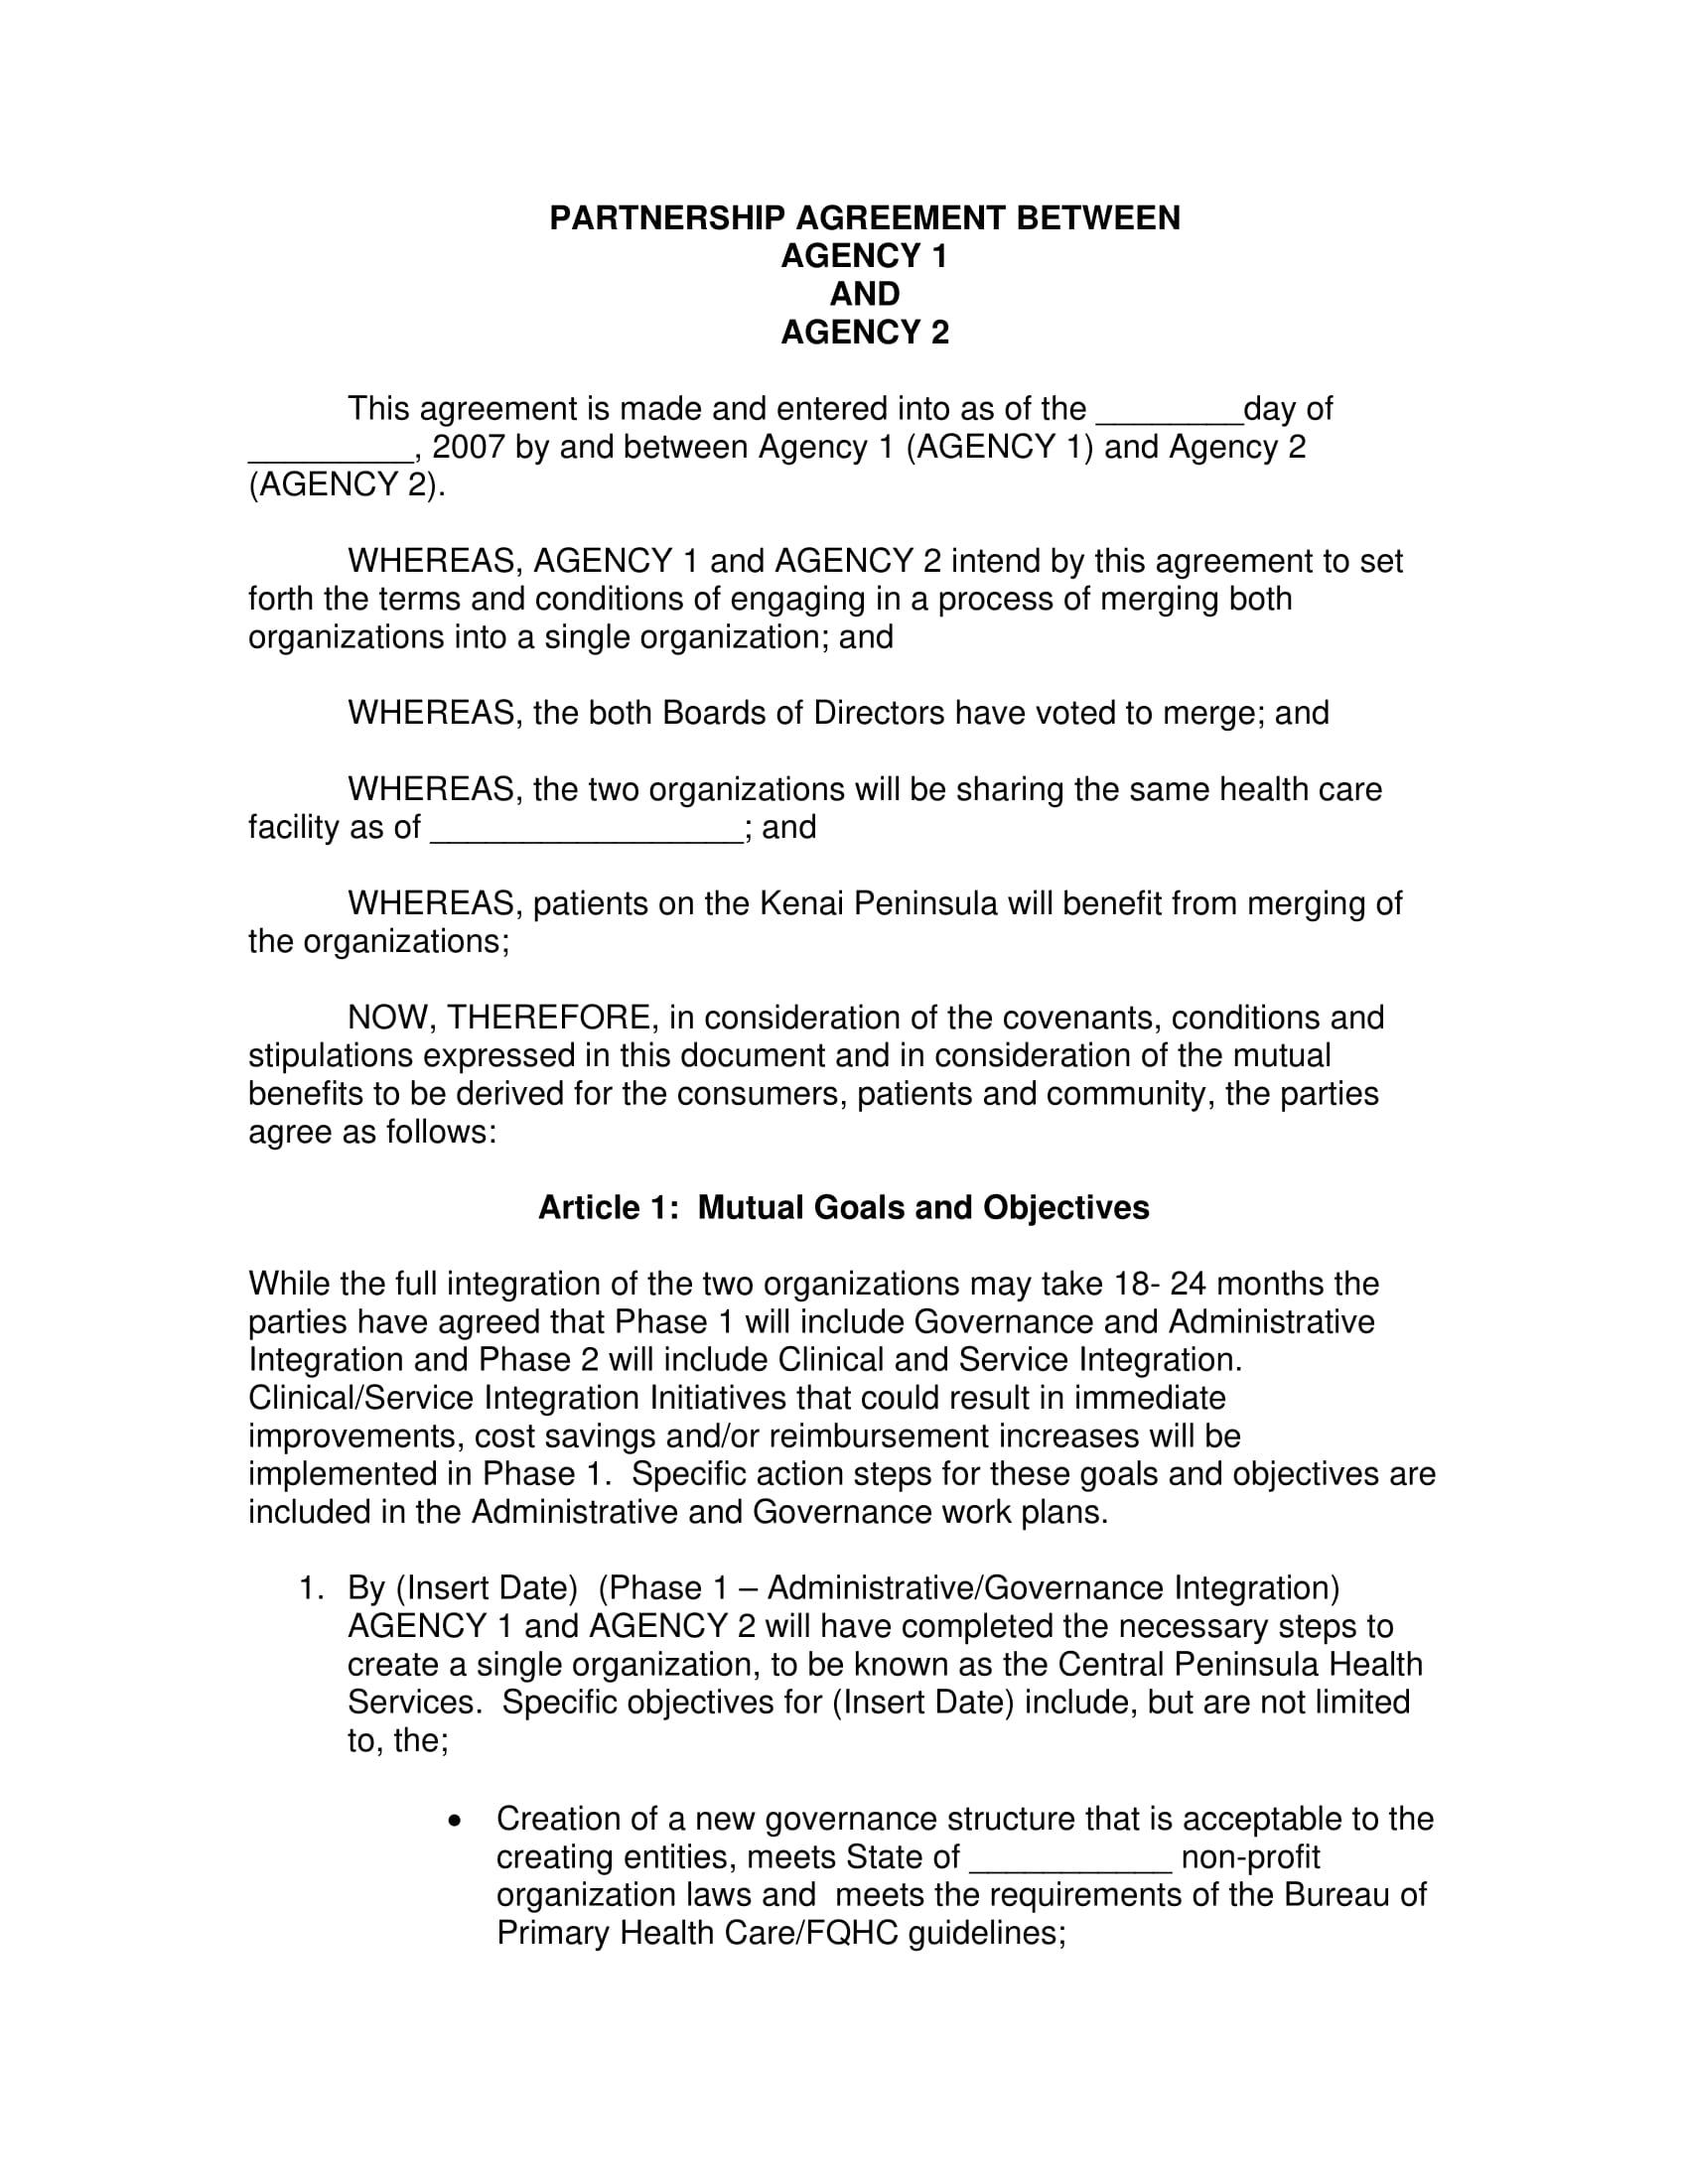 Agency Partnership Agreement Example